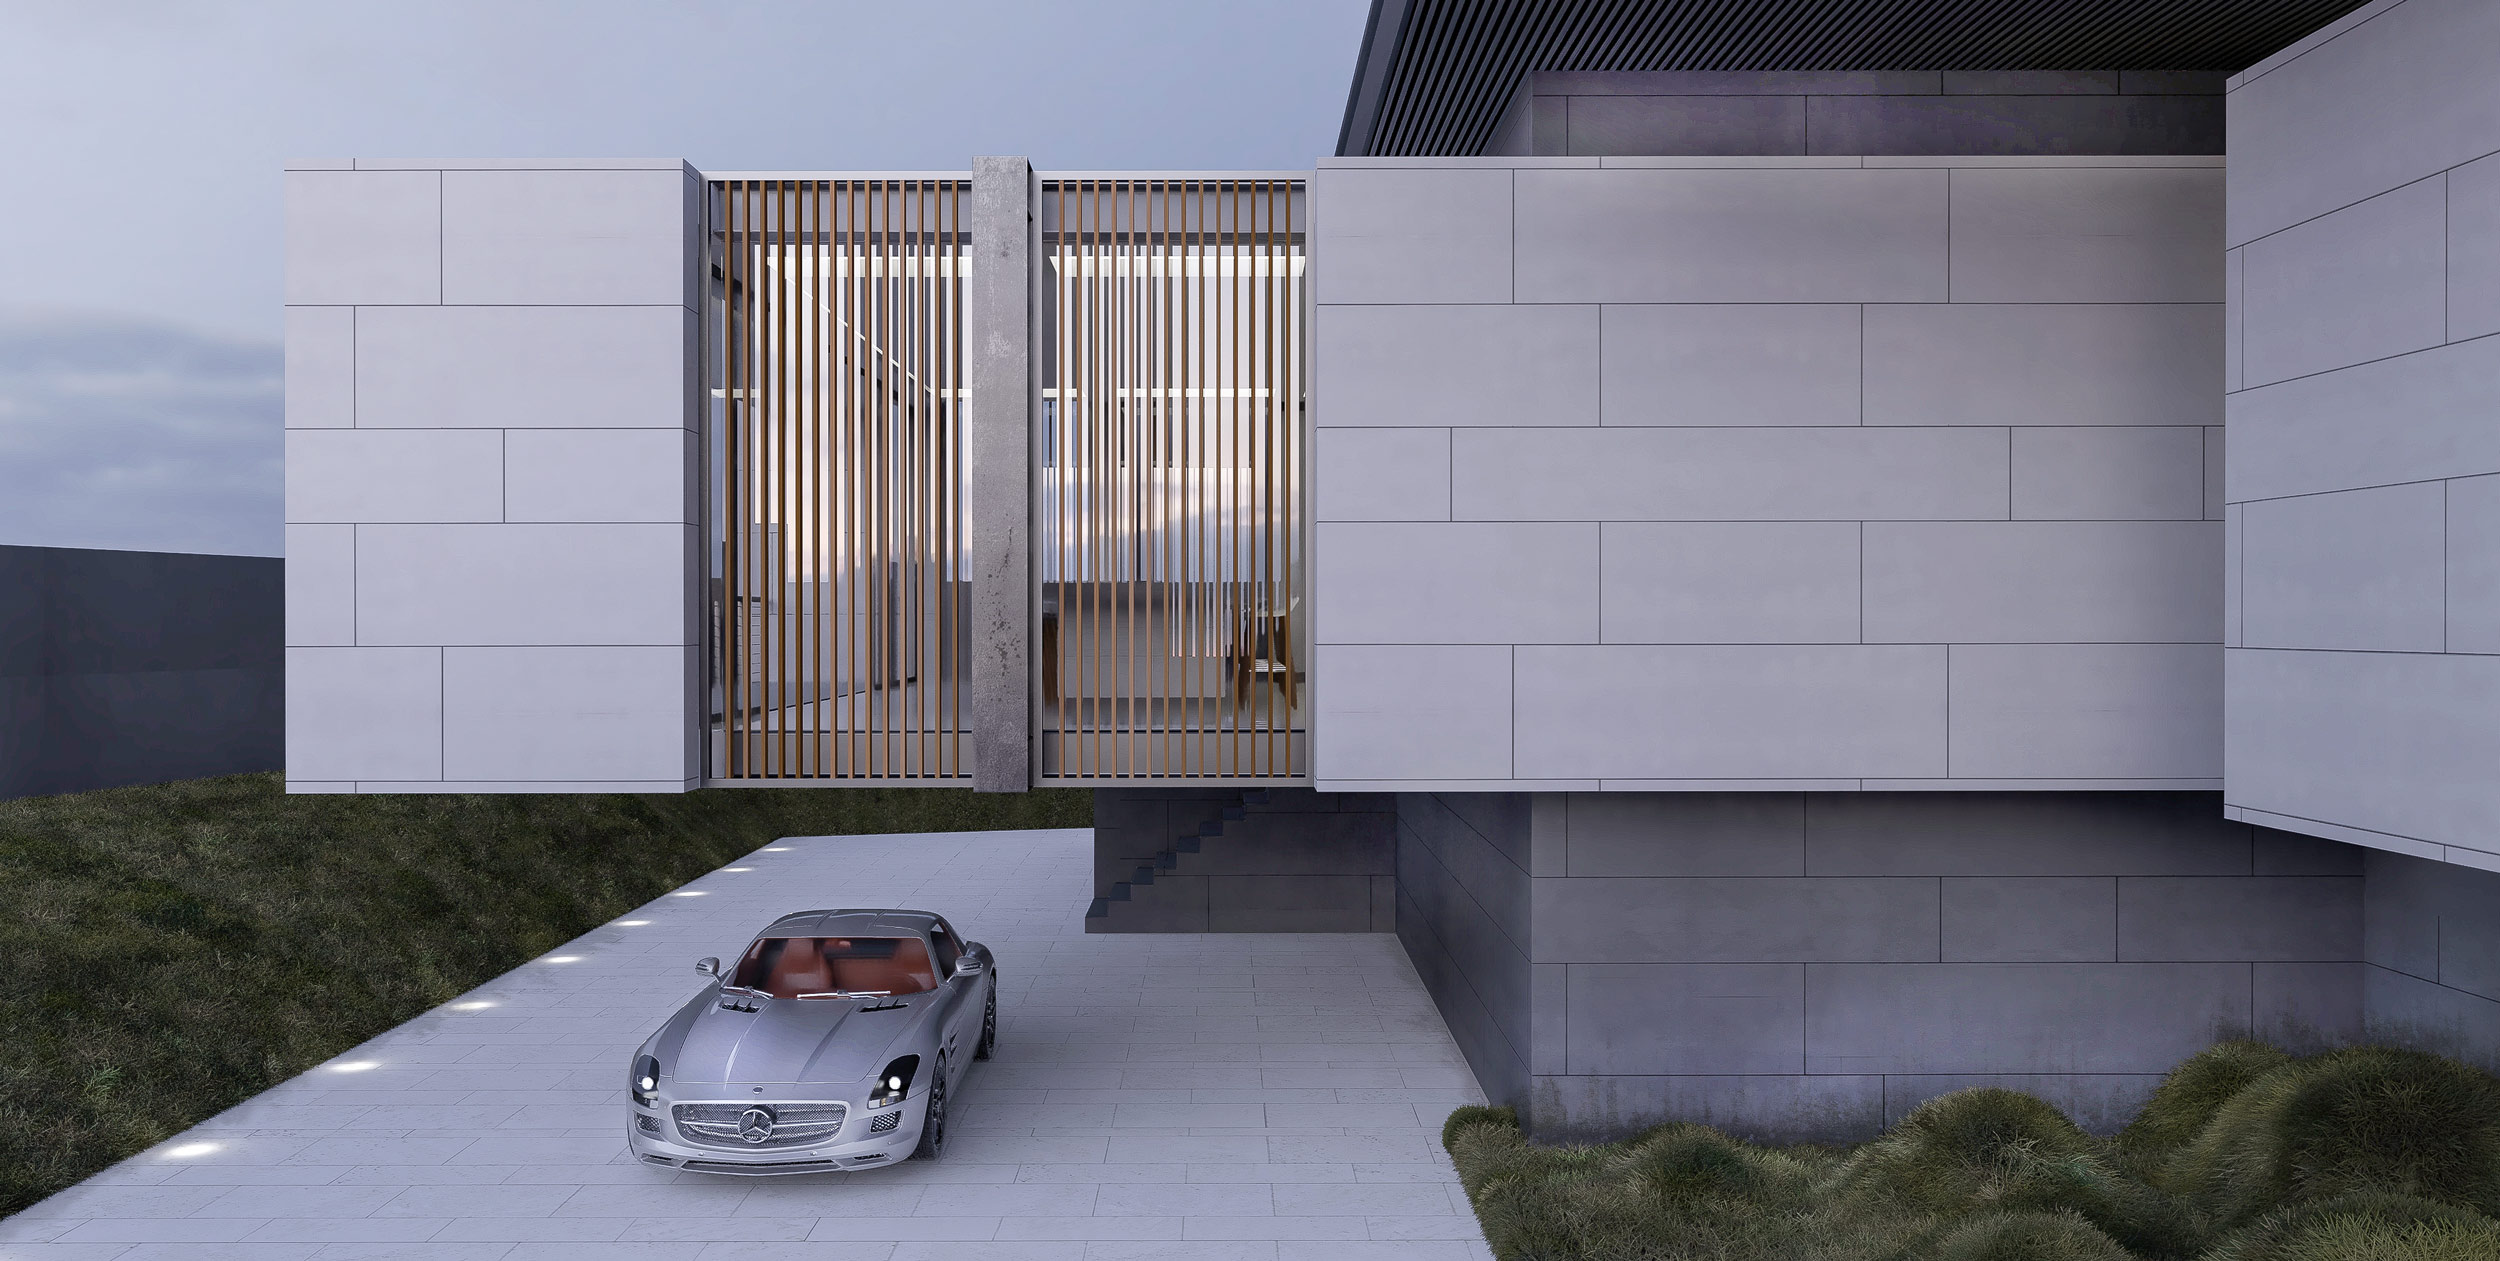 echmiadzin-house-armenia-archillusion-design-artur-nesterenko-05.jpg